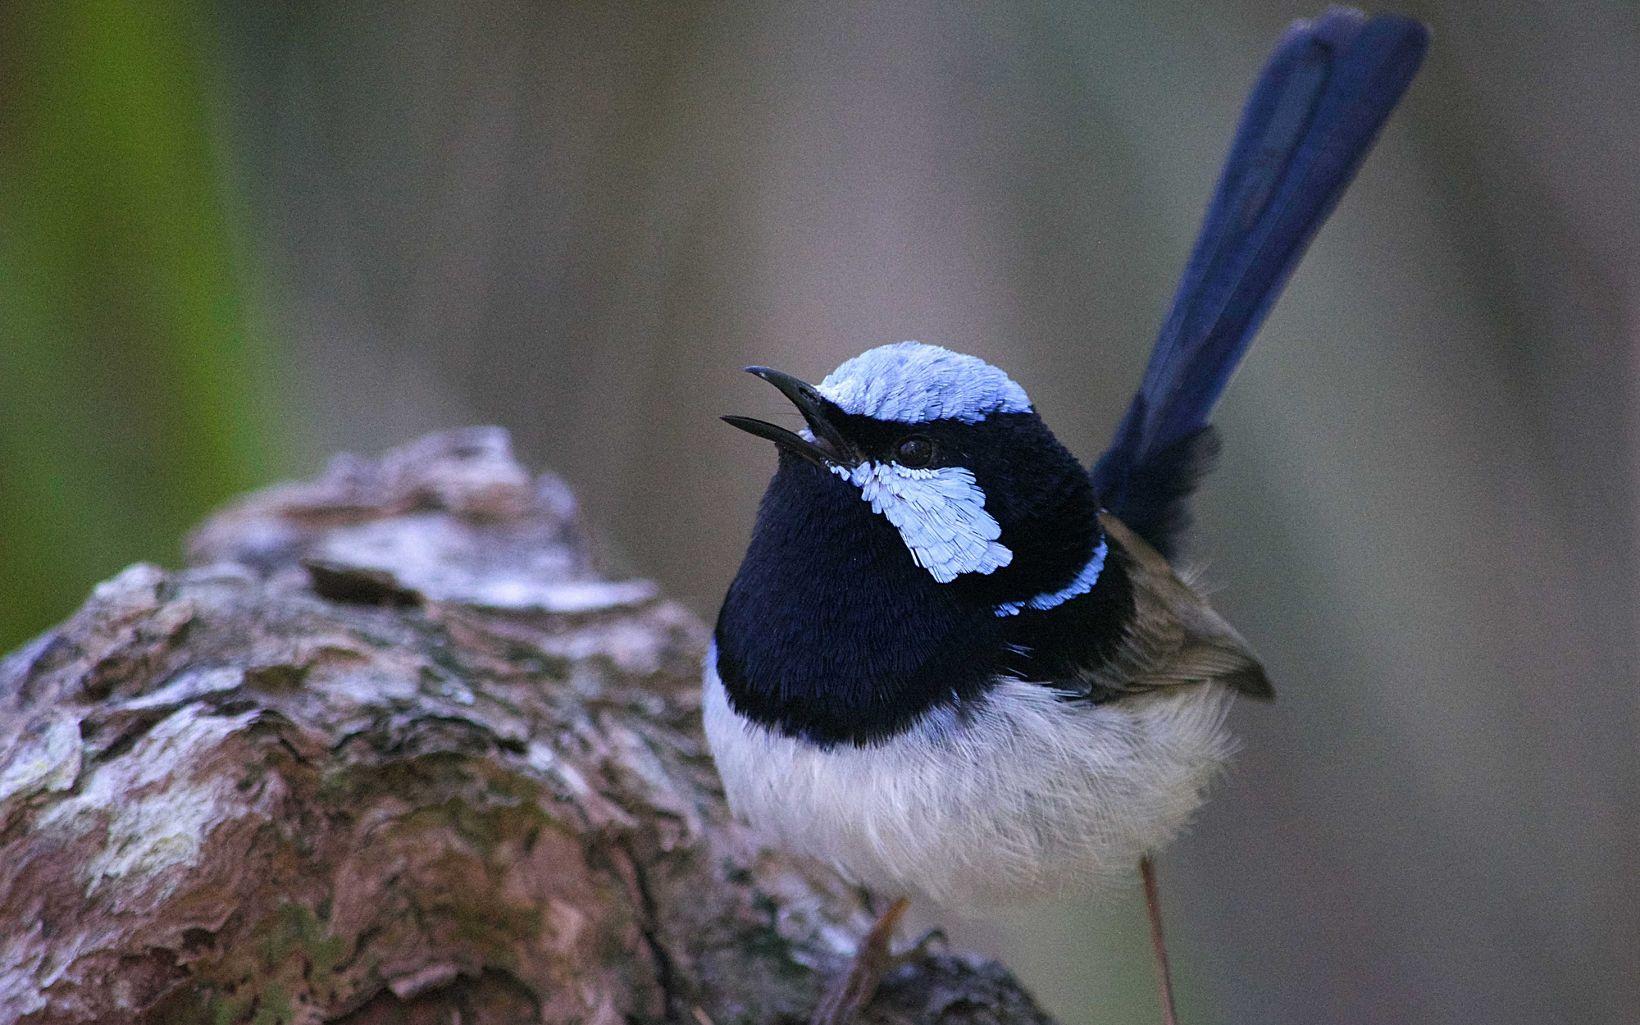 Superb Fairy-Wren, black-and-white bird native to Melbourne